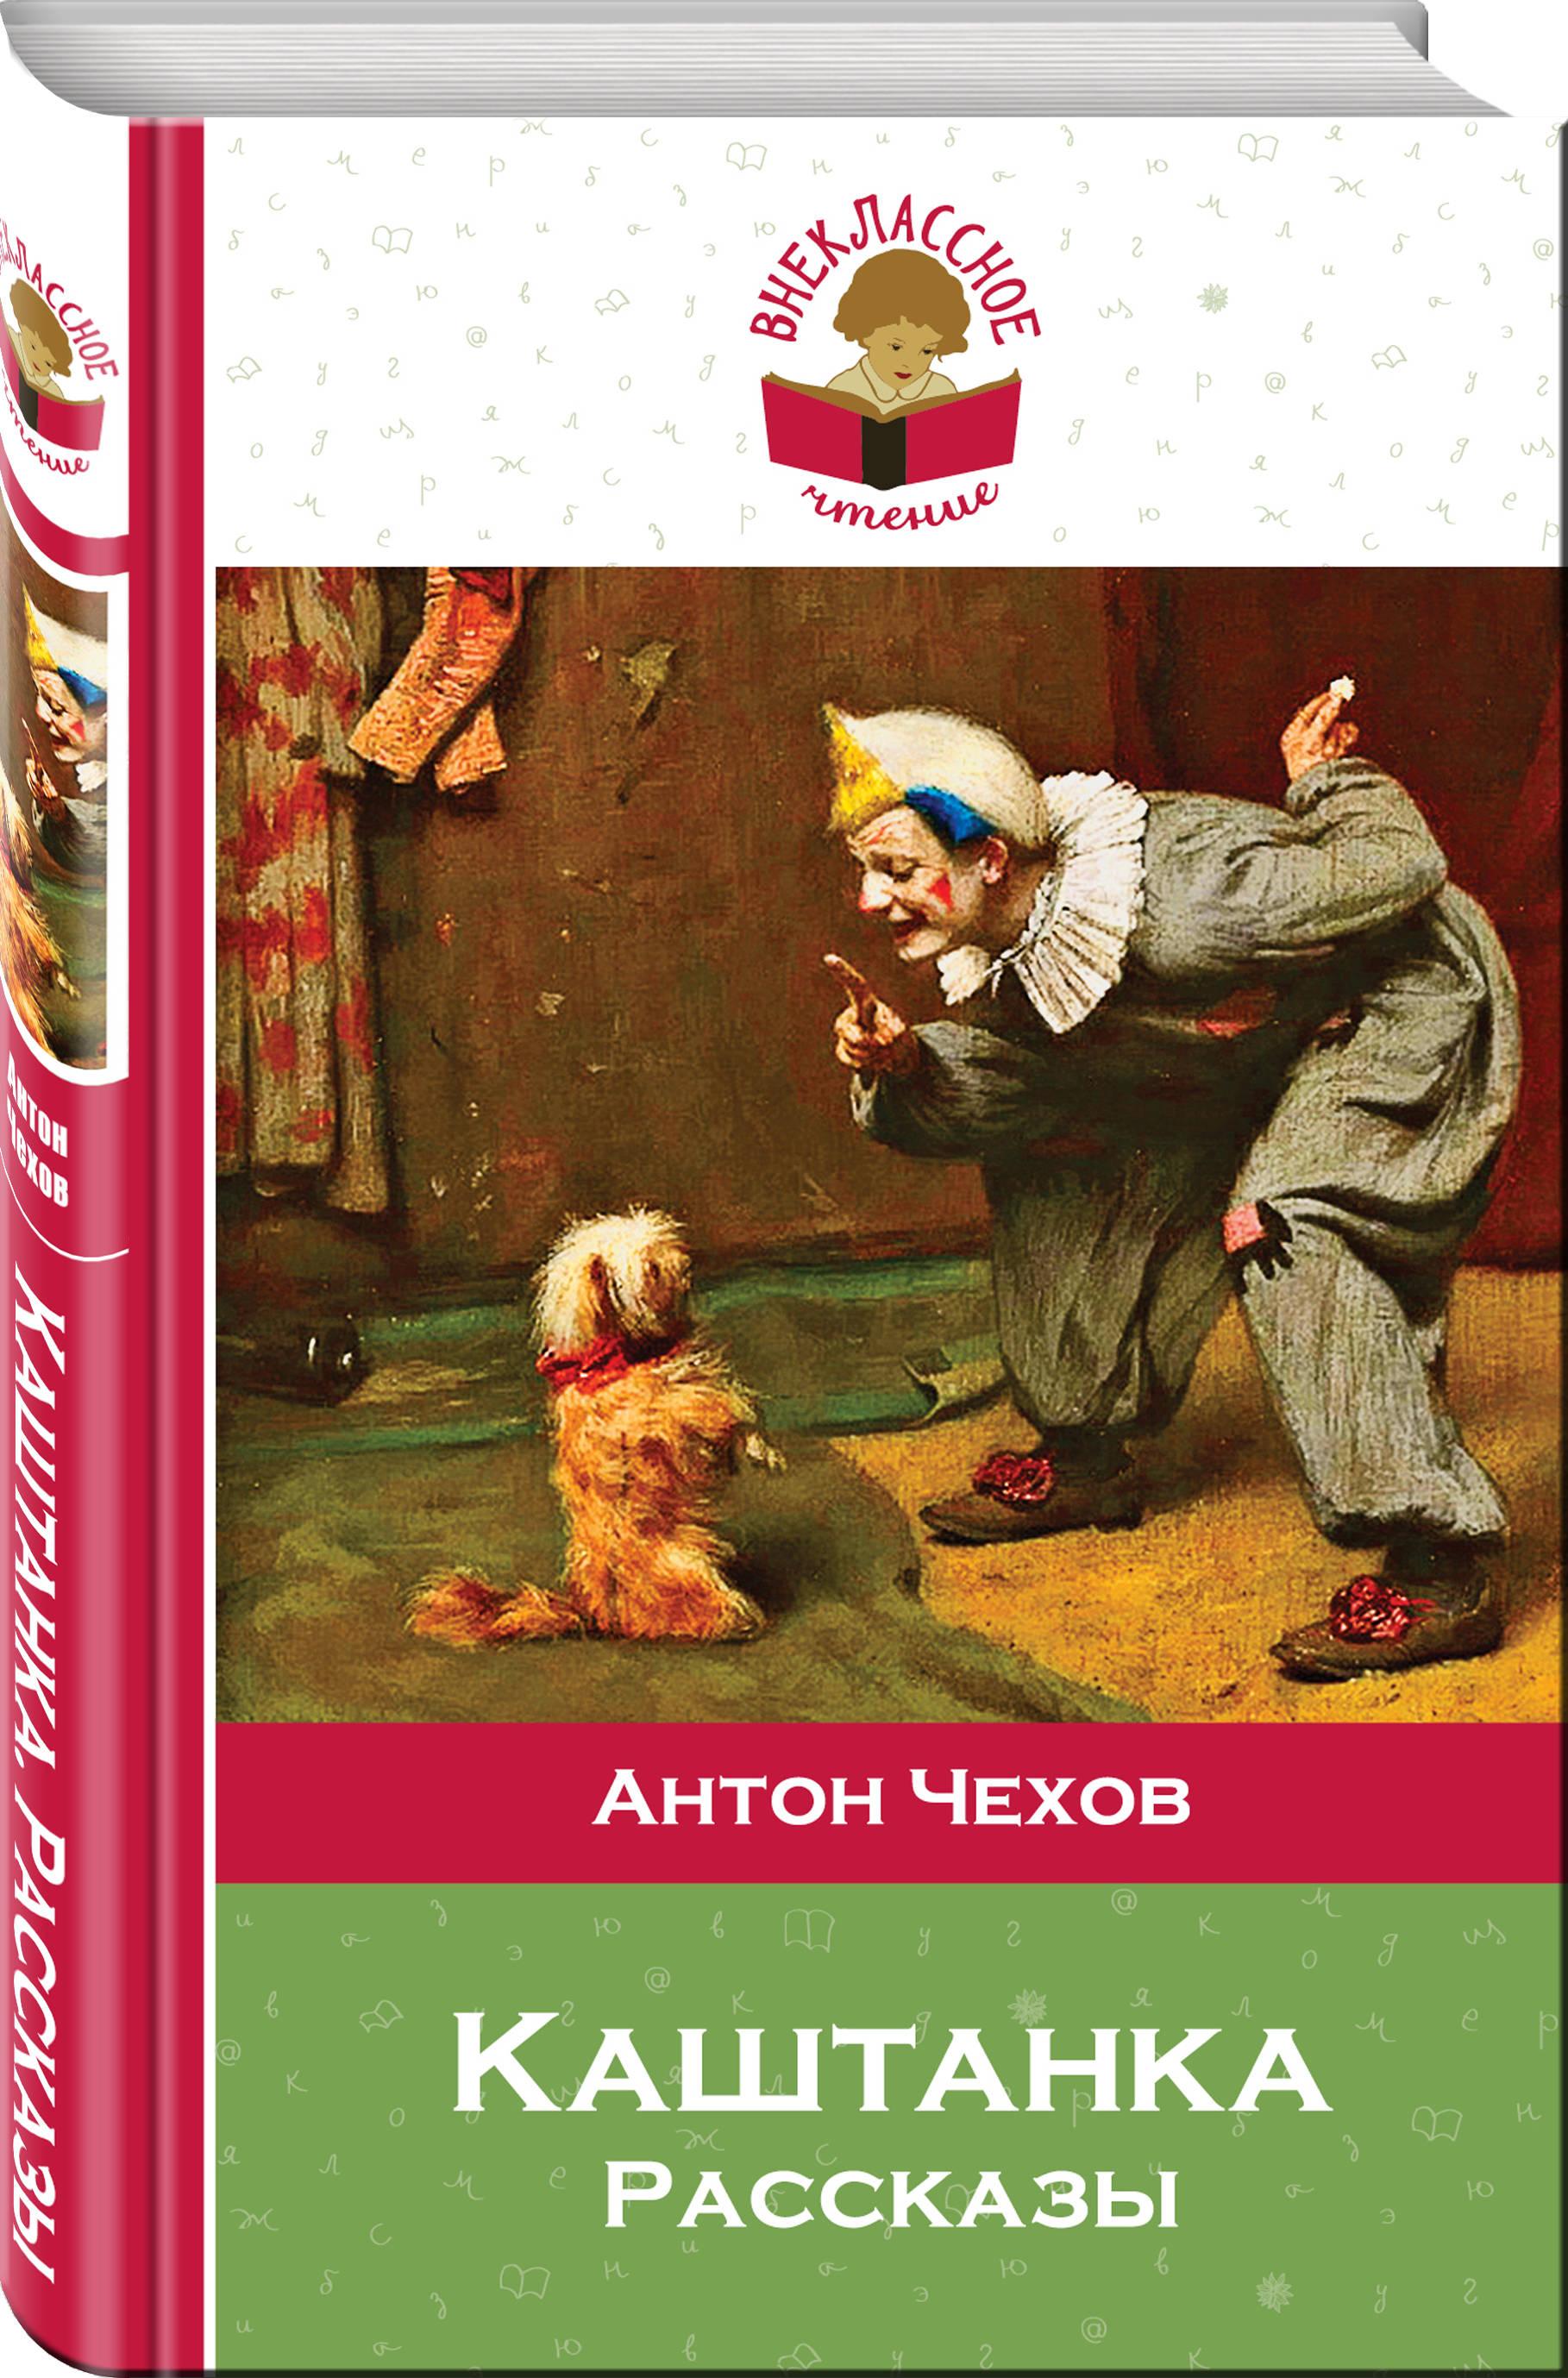 Чехов Антон Павлович Каштанка н ю тяпугина антон павлович чехов в школе